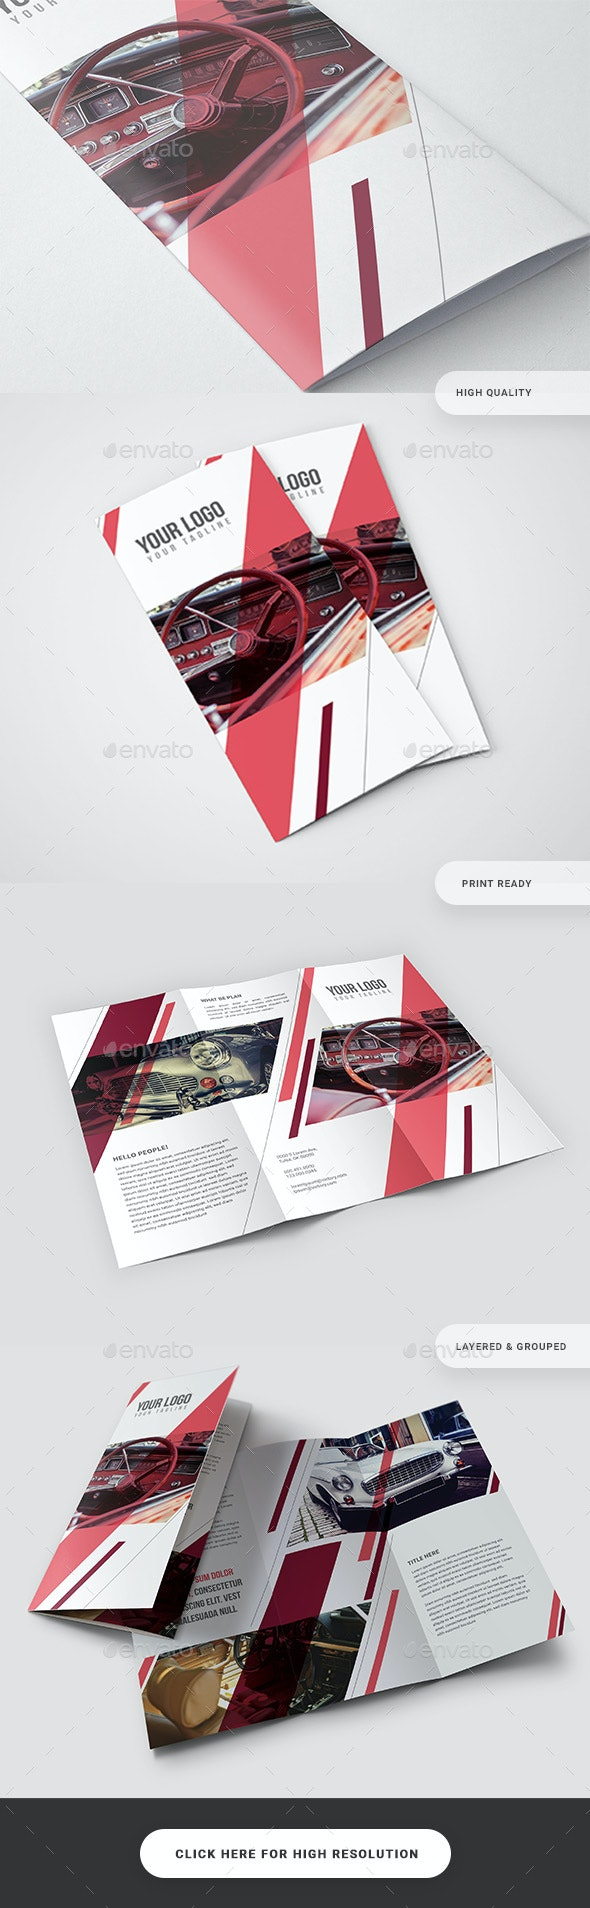 Pattern Trifold Brochure - Catalogs Brochures